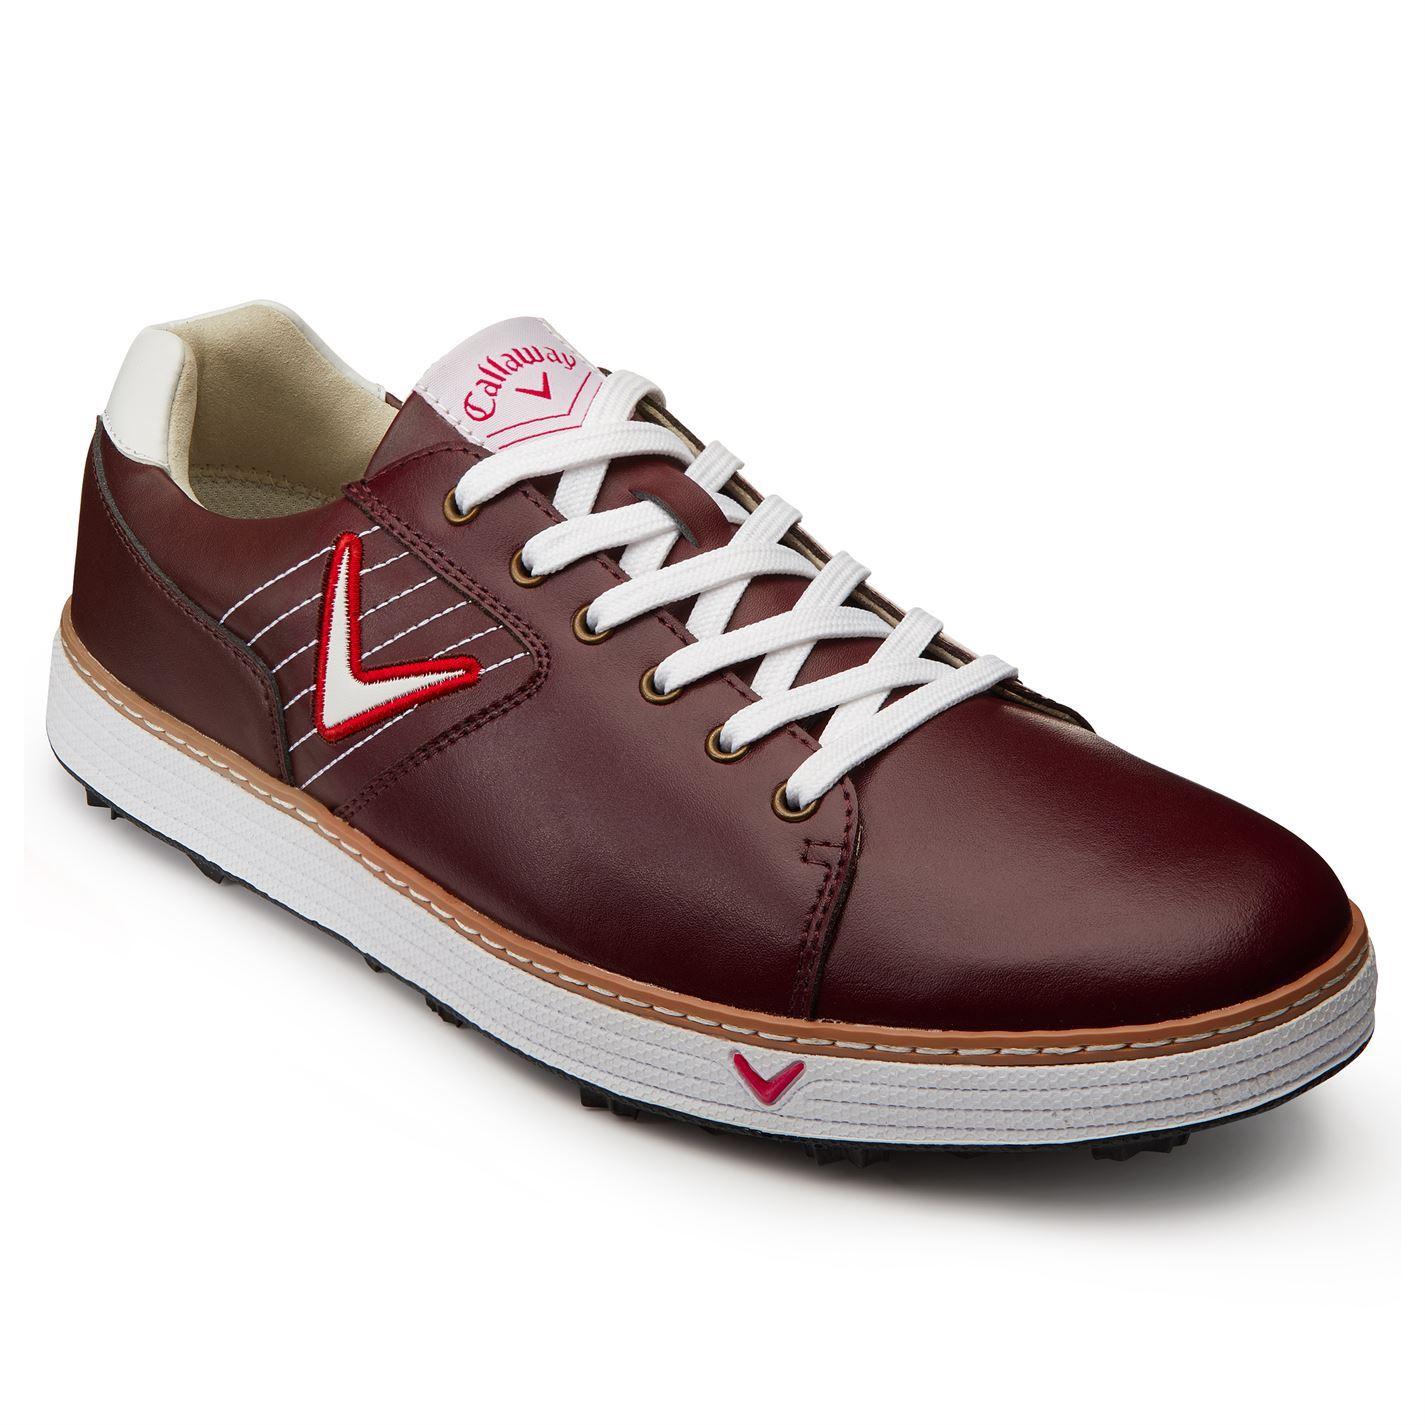 Callaway-Delmar-Urban-Golf-Shoes-Mens-Spikeless-Footwear thumbnail 8